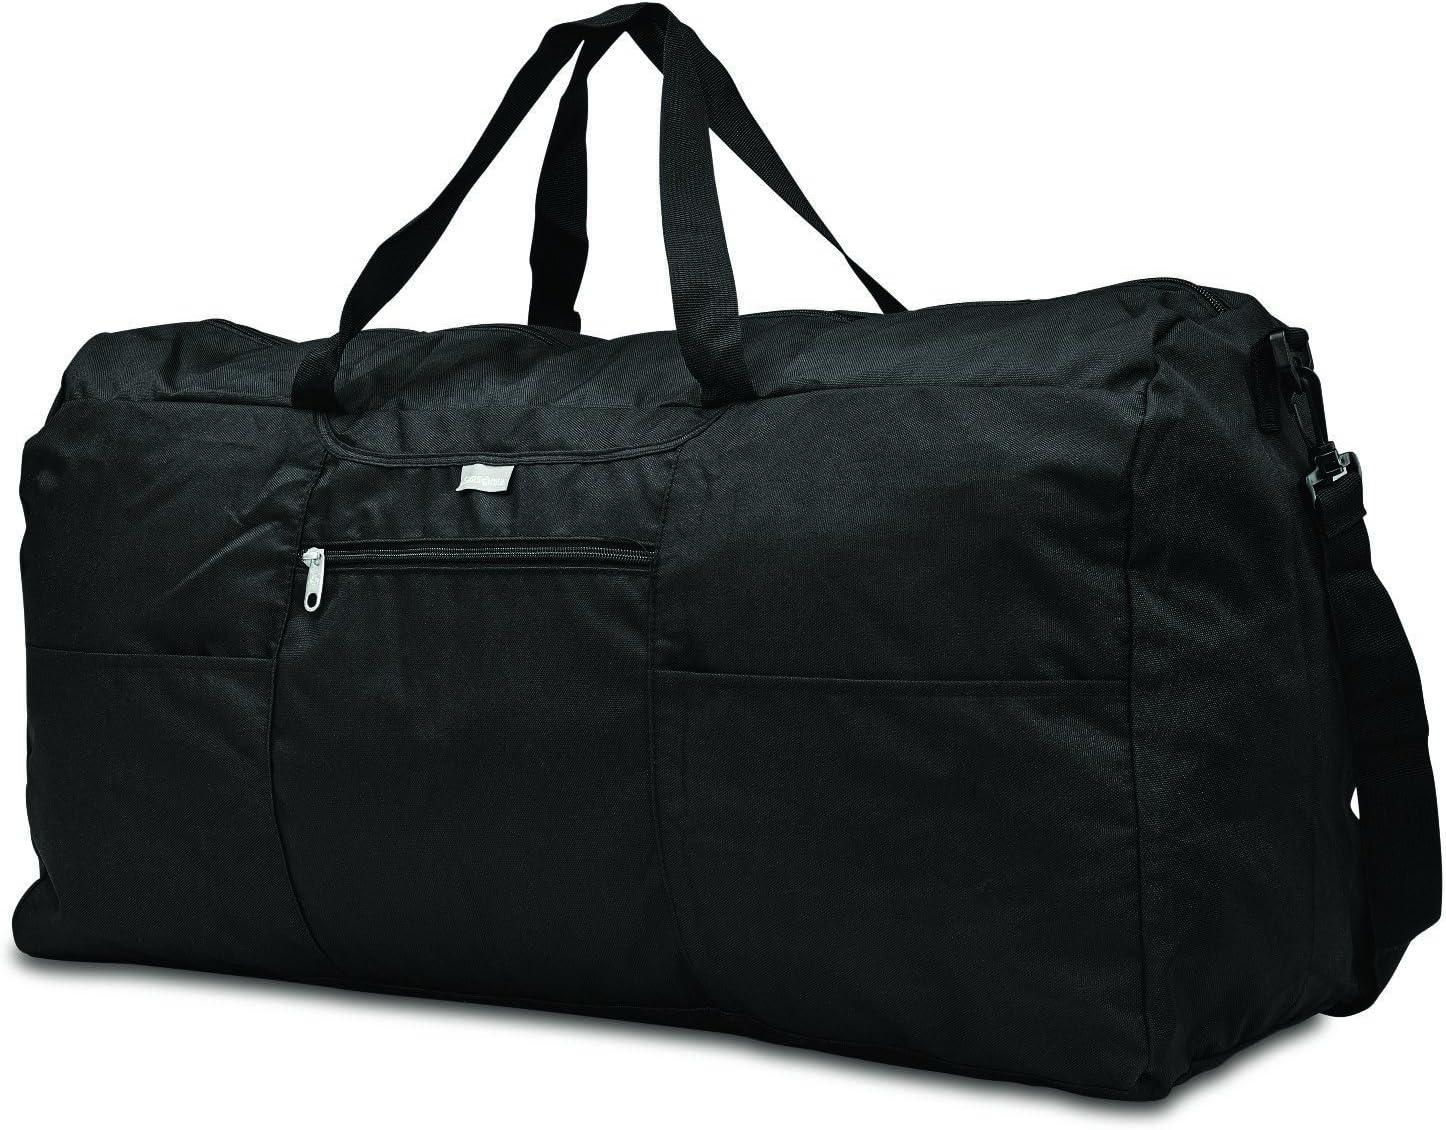 Samsonite Foldaway Duffle Extra Large Duffel Bag, Black, One Size